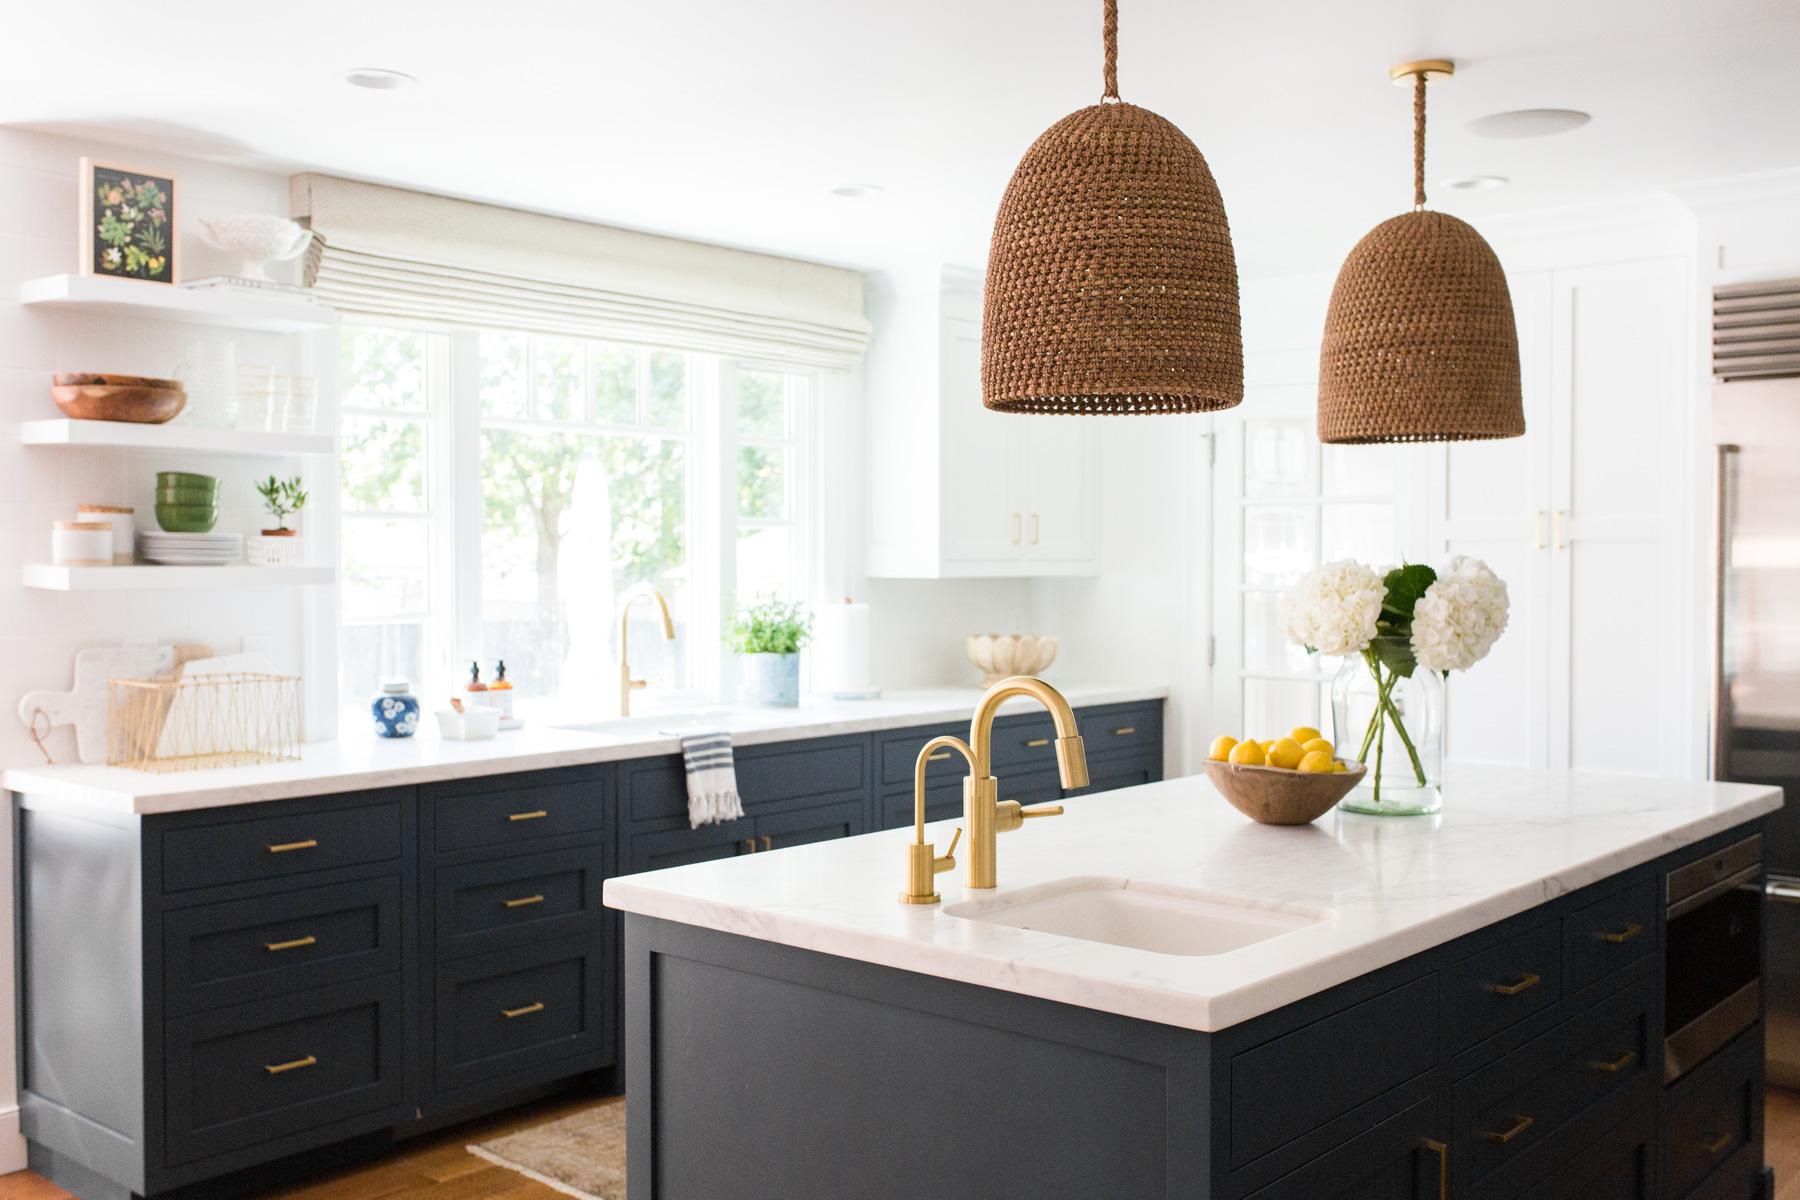 Studio McGee's Kitchen Styling Tips